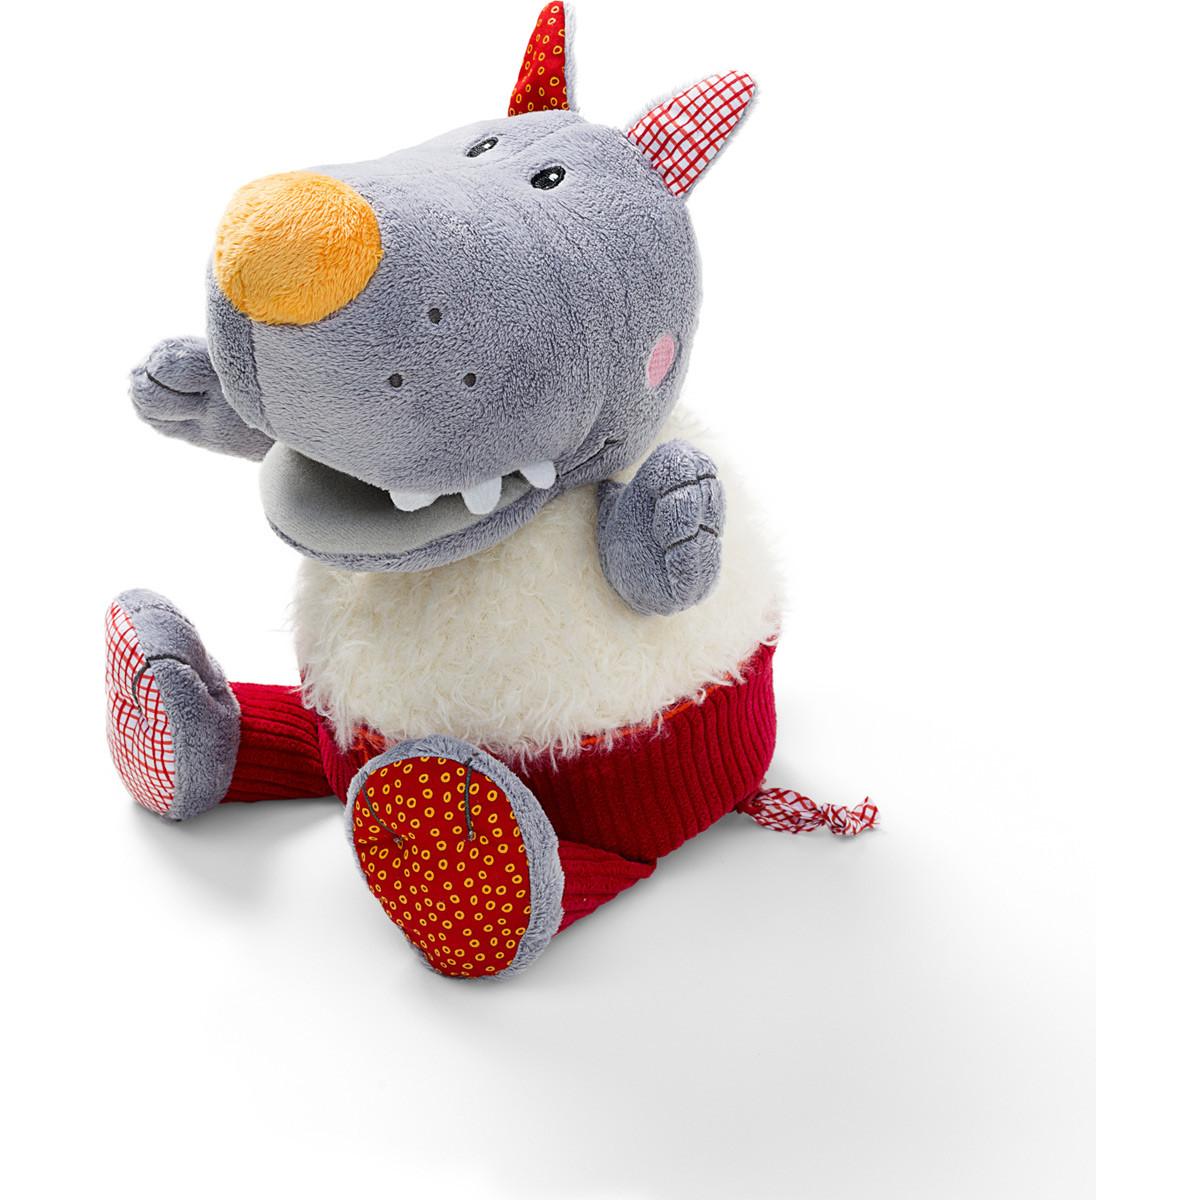 Lilliputiens - Мягкая игрушка-копилка волк Николас